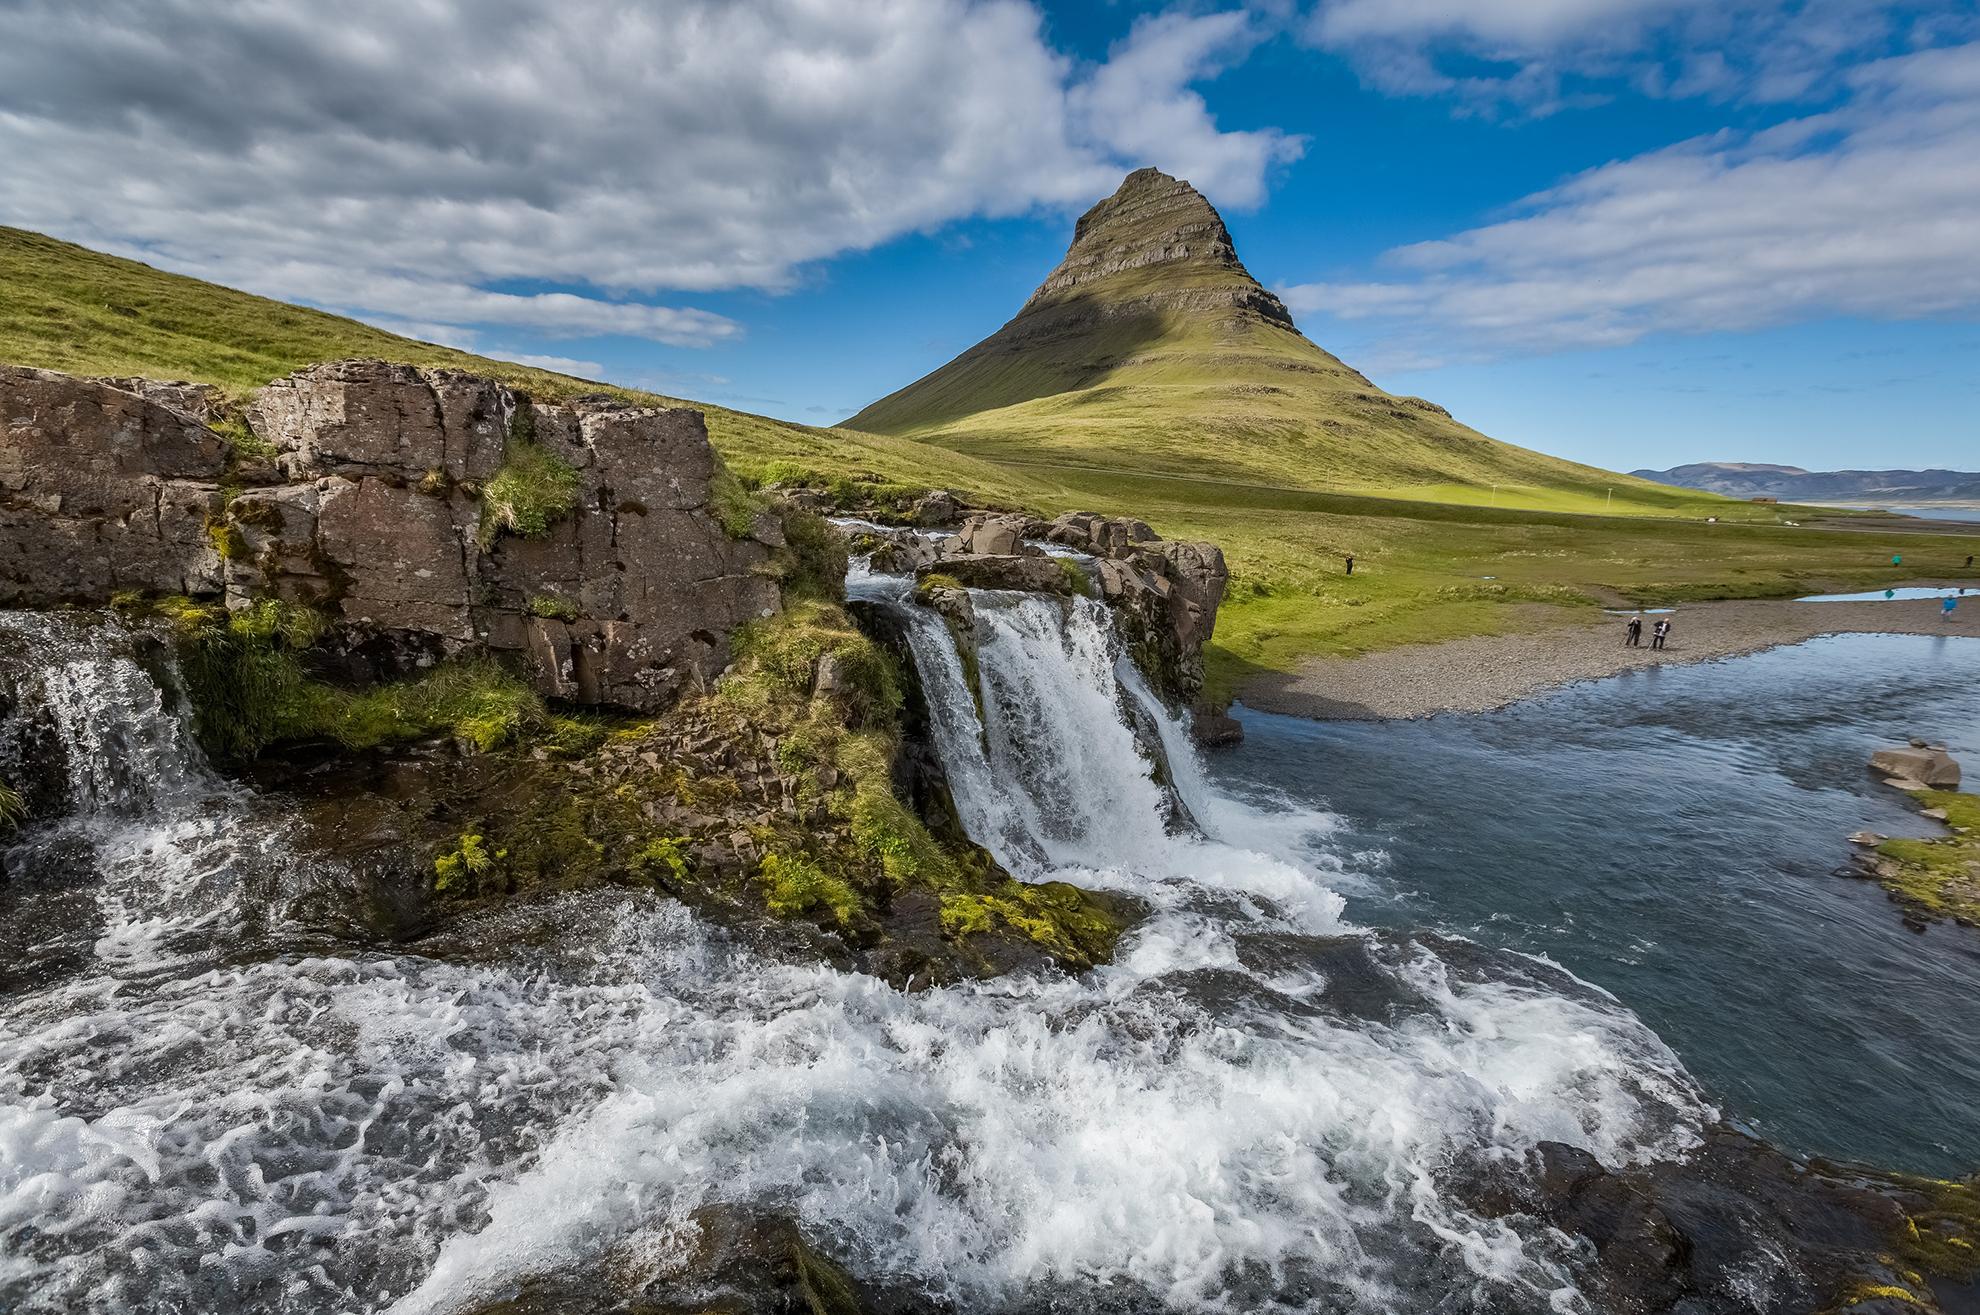 Kirkjufell Iceland Atlantik Incentive cruise conference DMC PCO.jpg